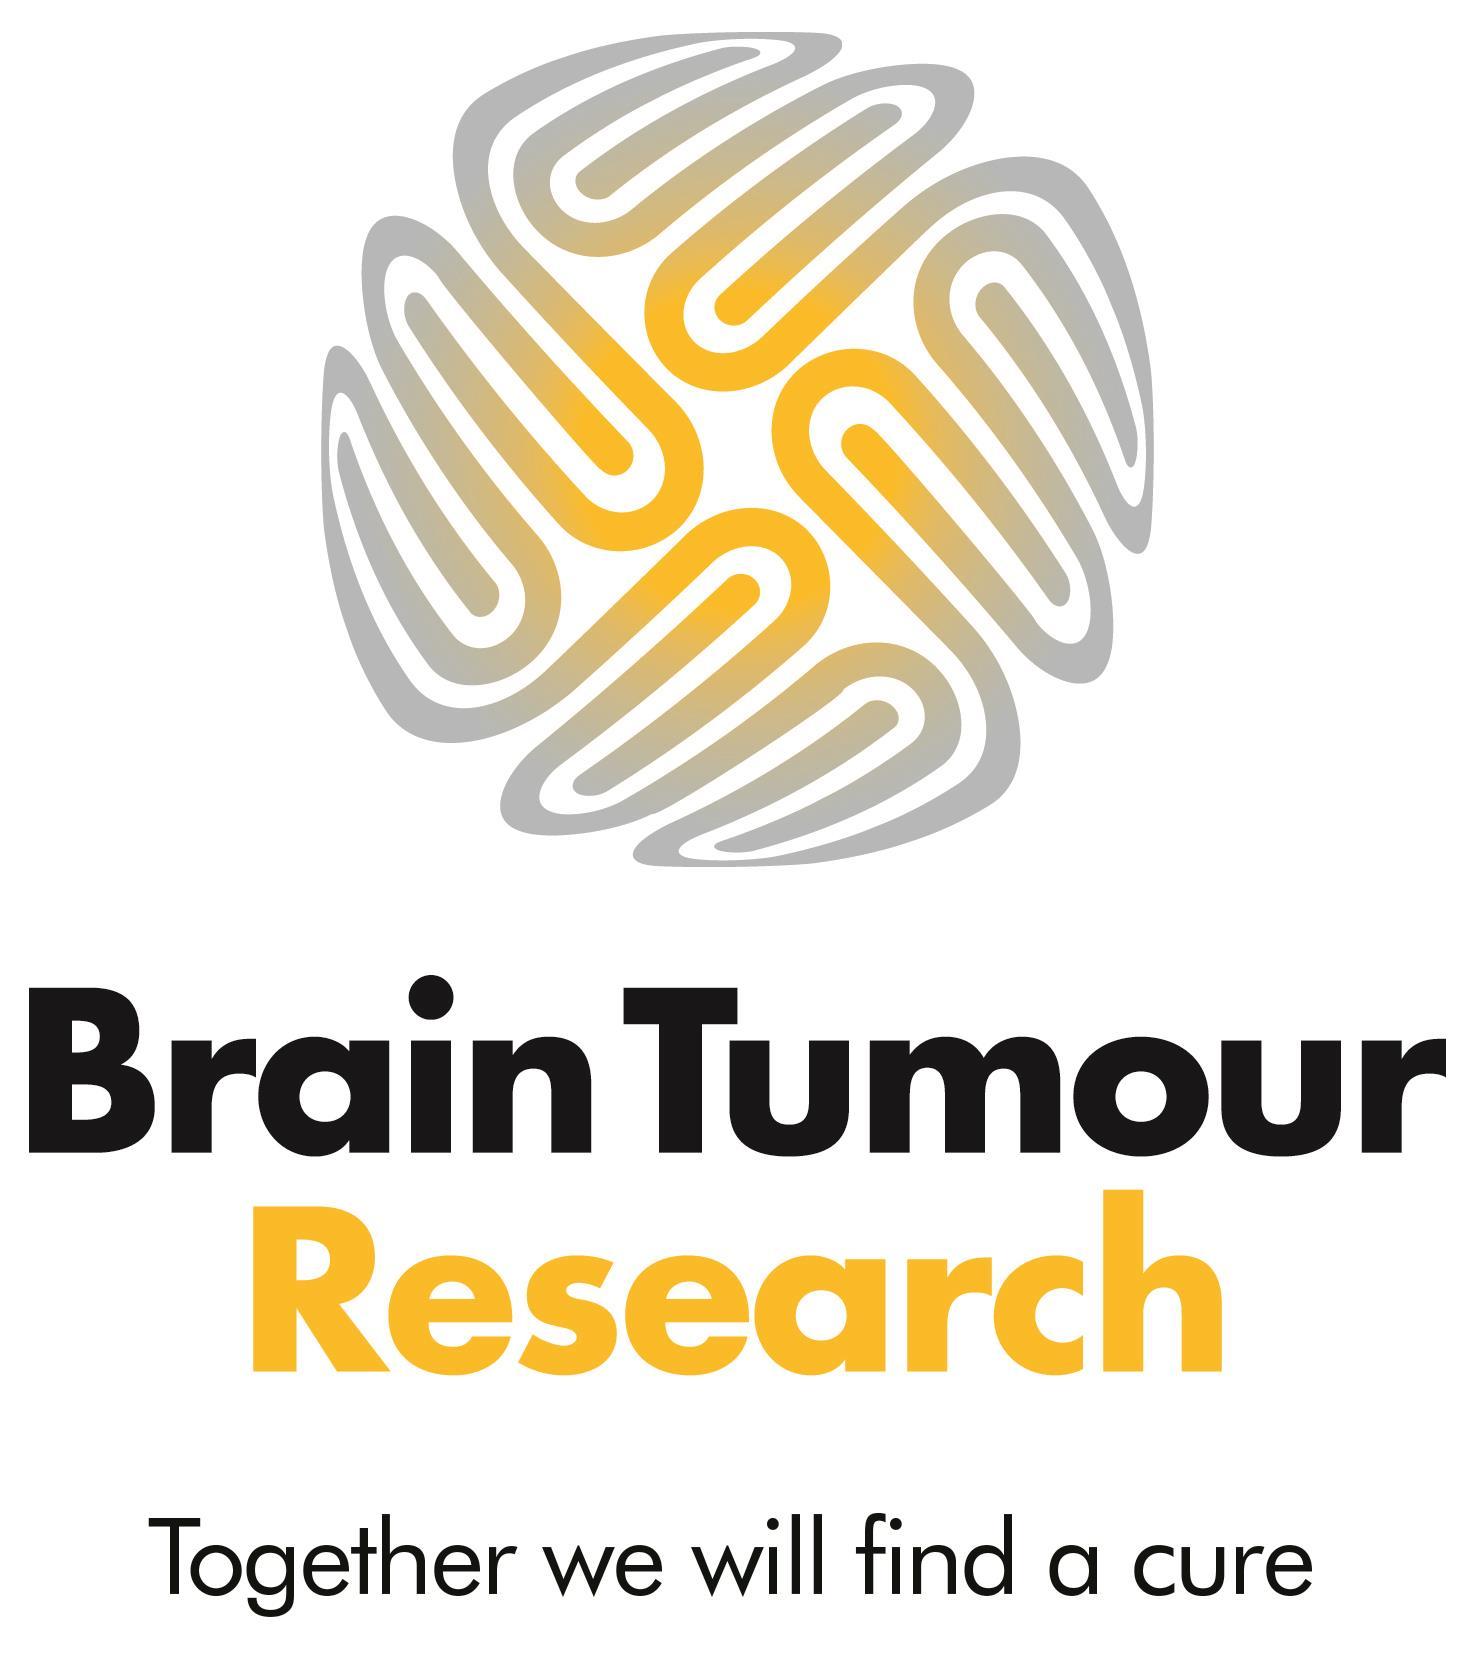 Brain Tumour Research logo